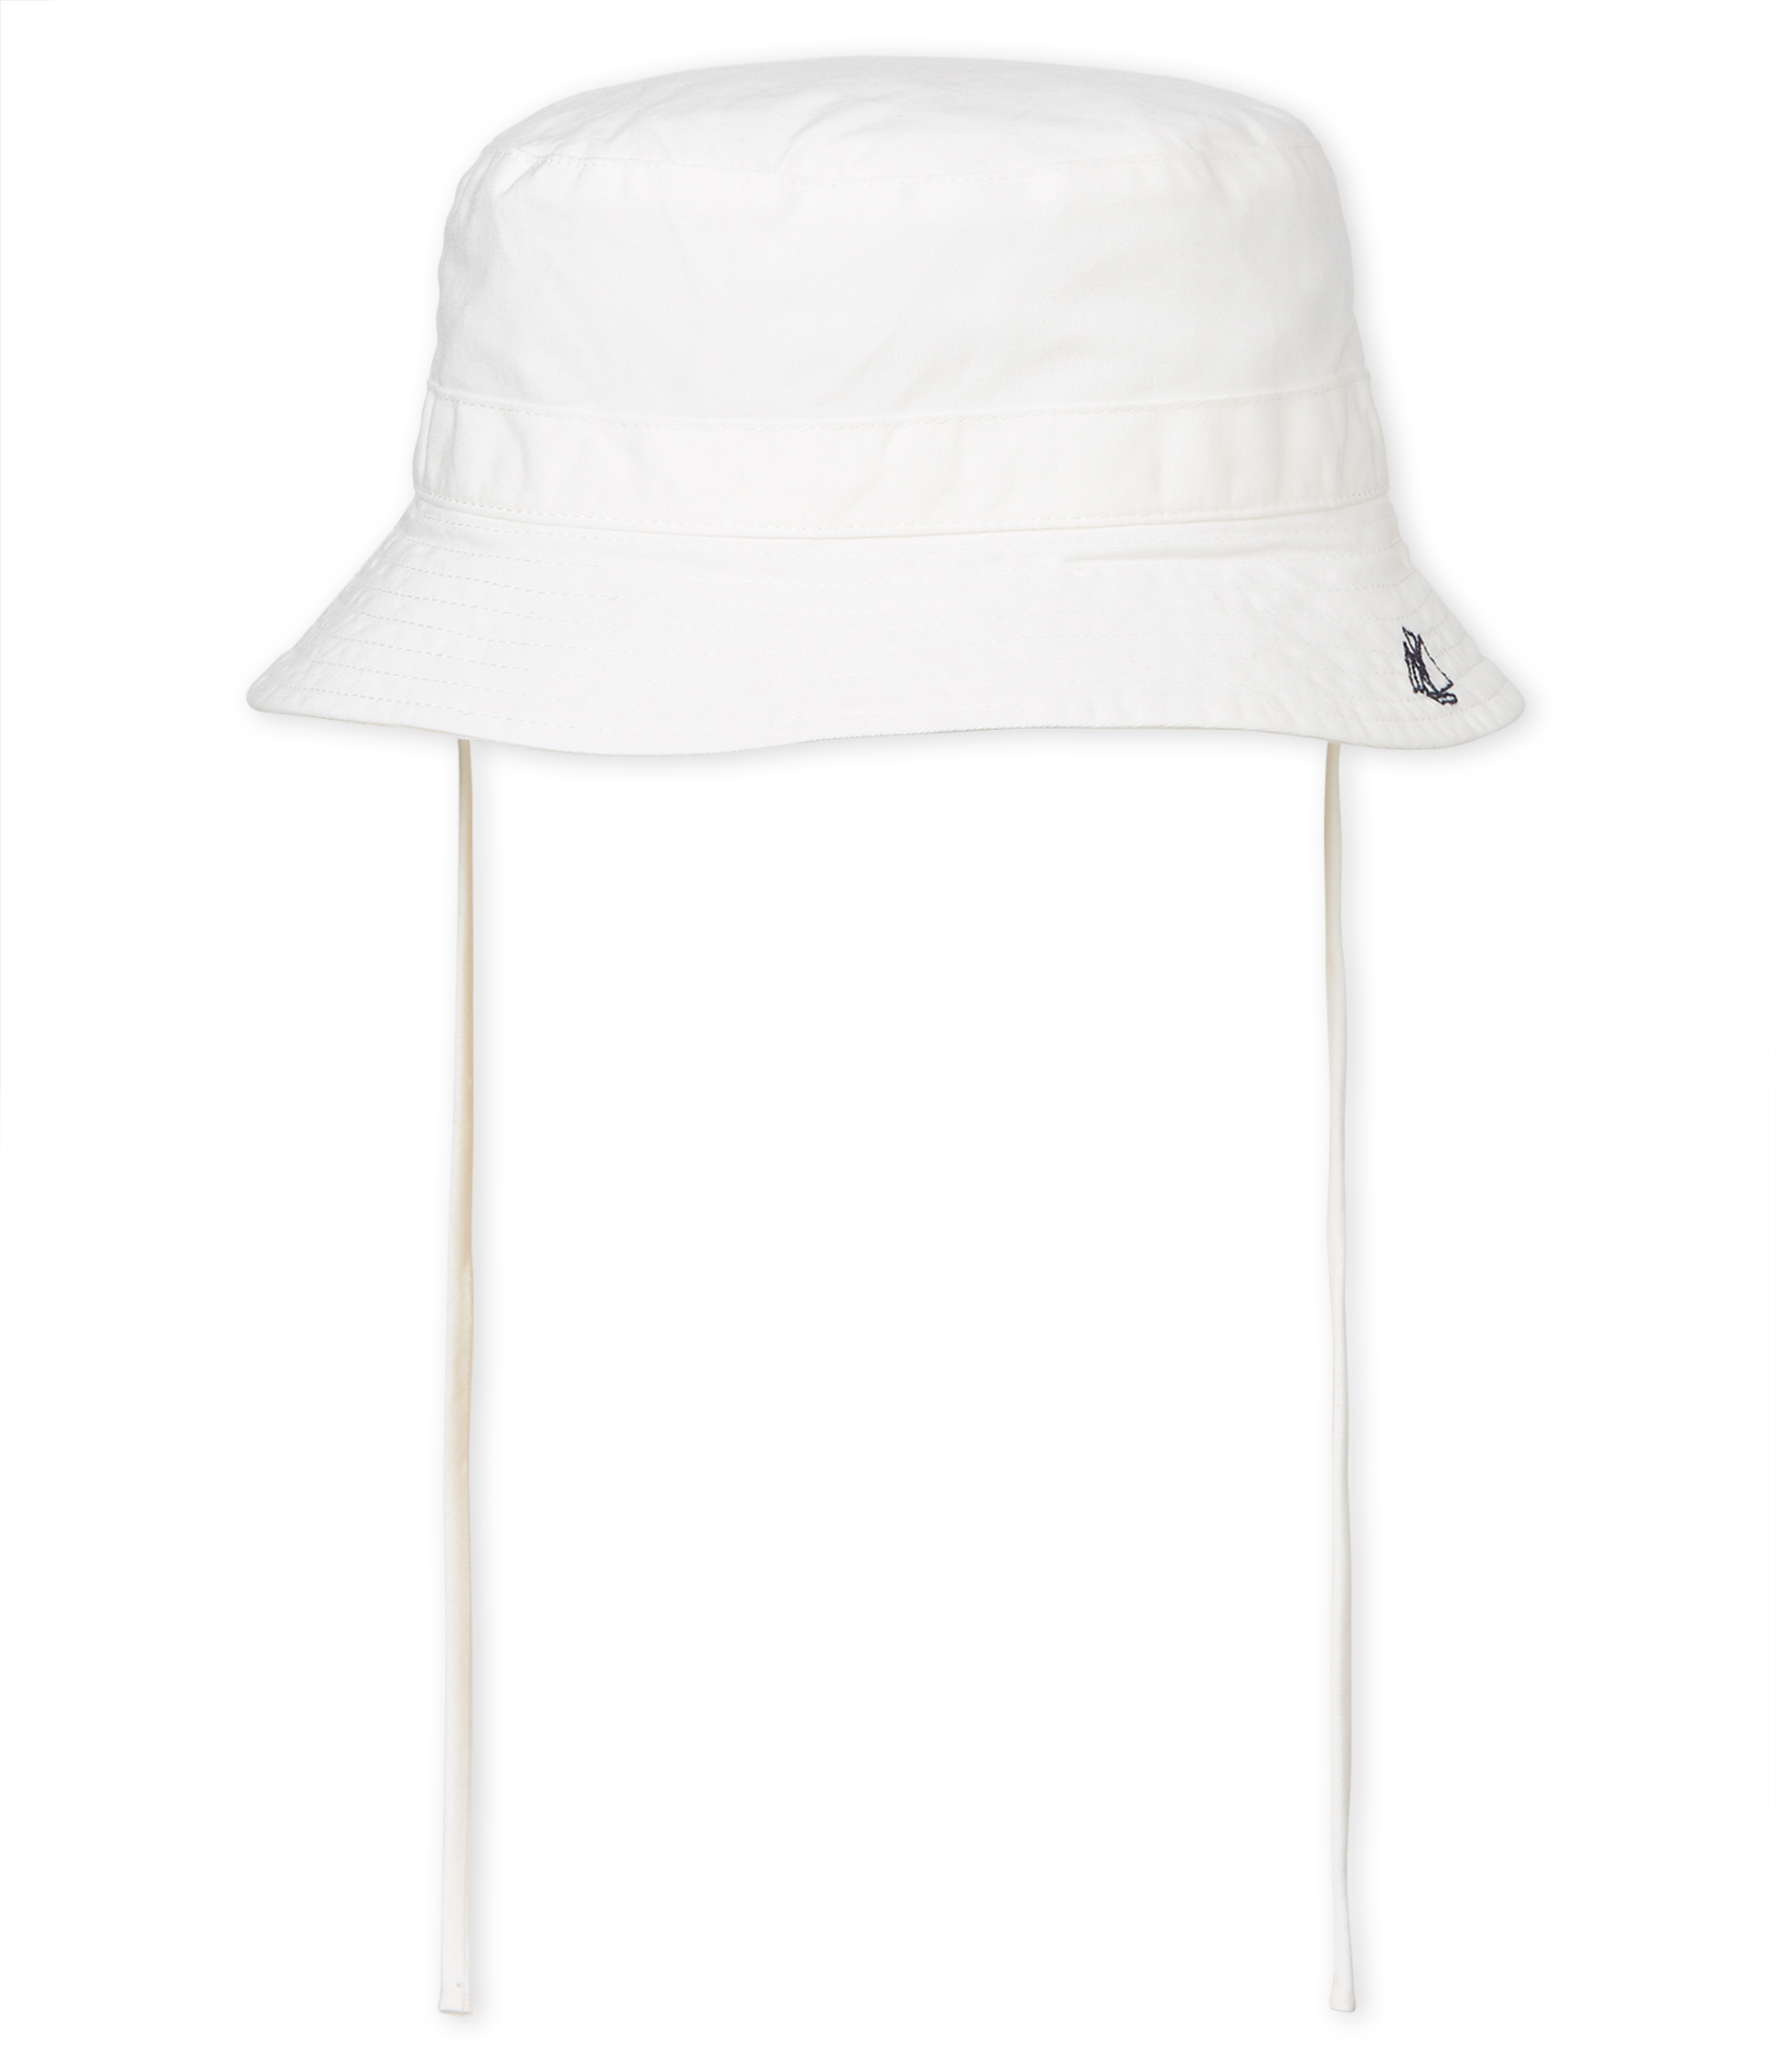 a5a96db7e Baby boys' twill sun hat